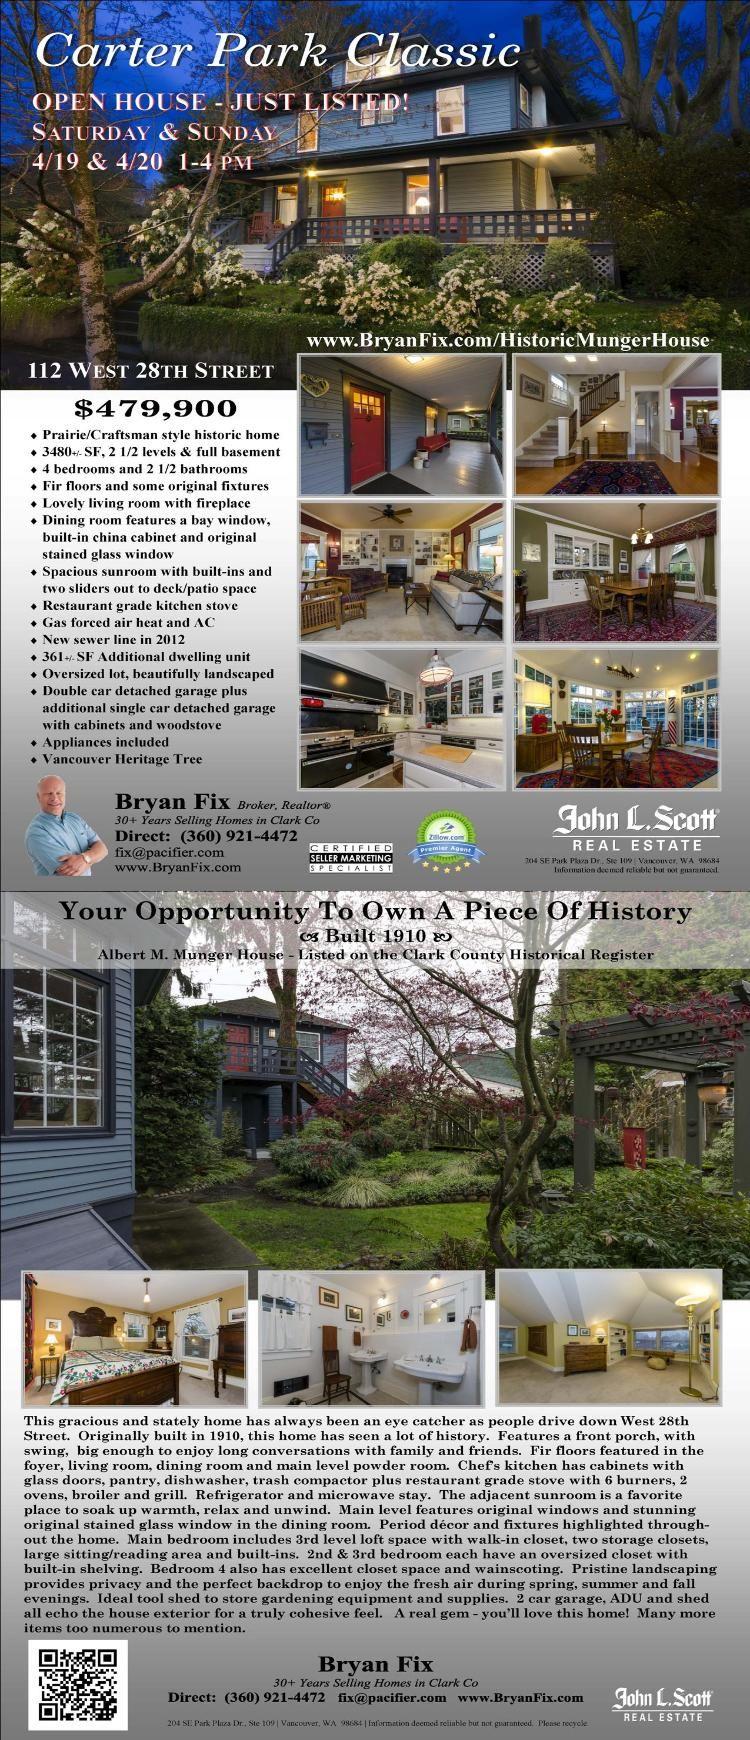 Sat Sun Open House Real Estate For Sale 479 900 4 Bdrm 2 5